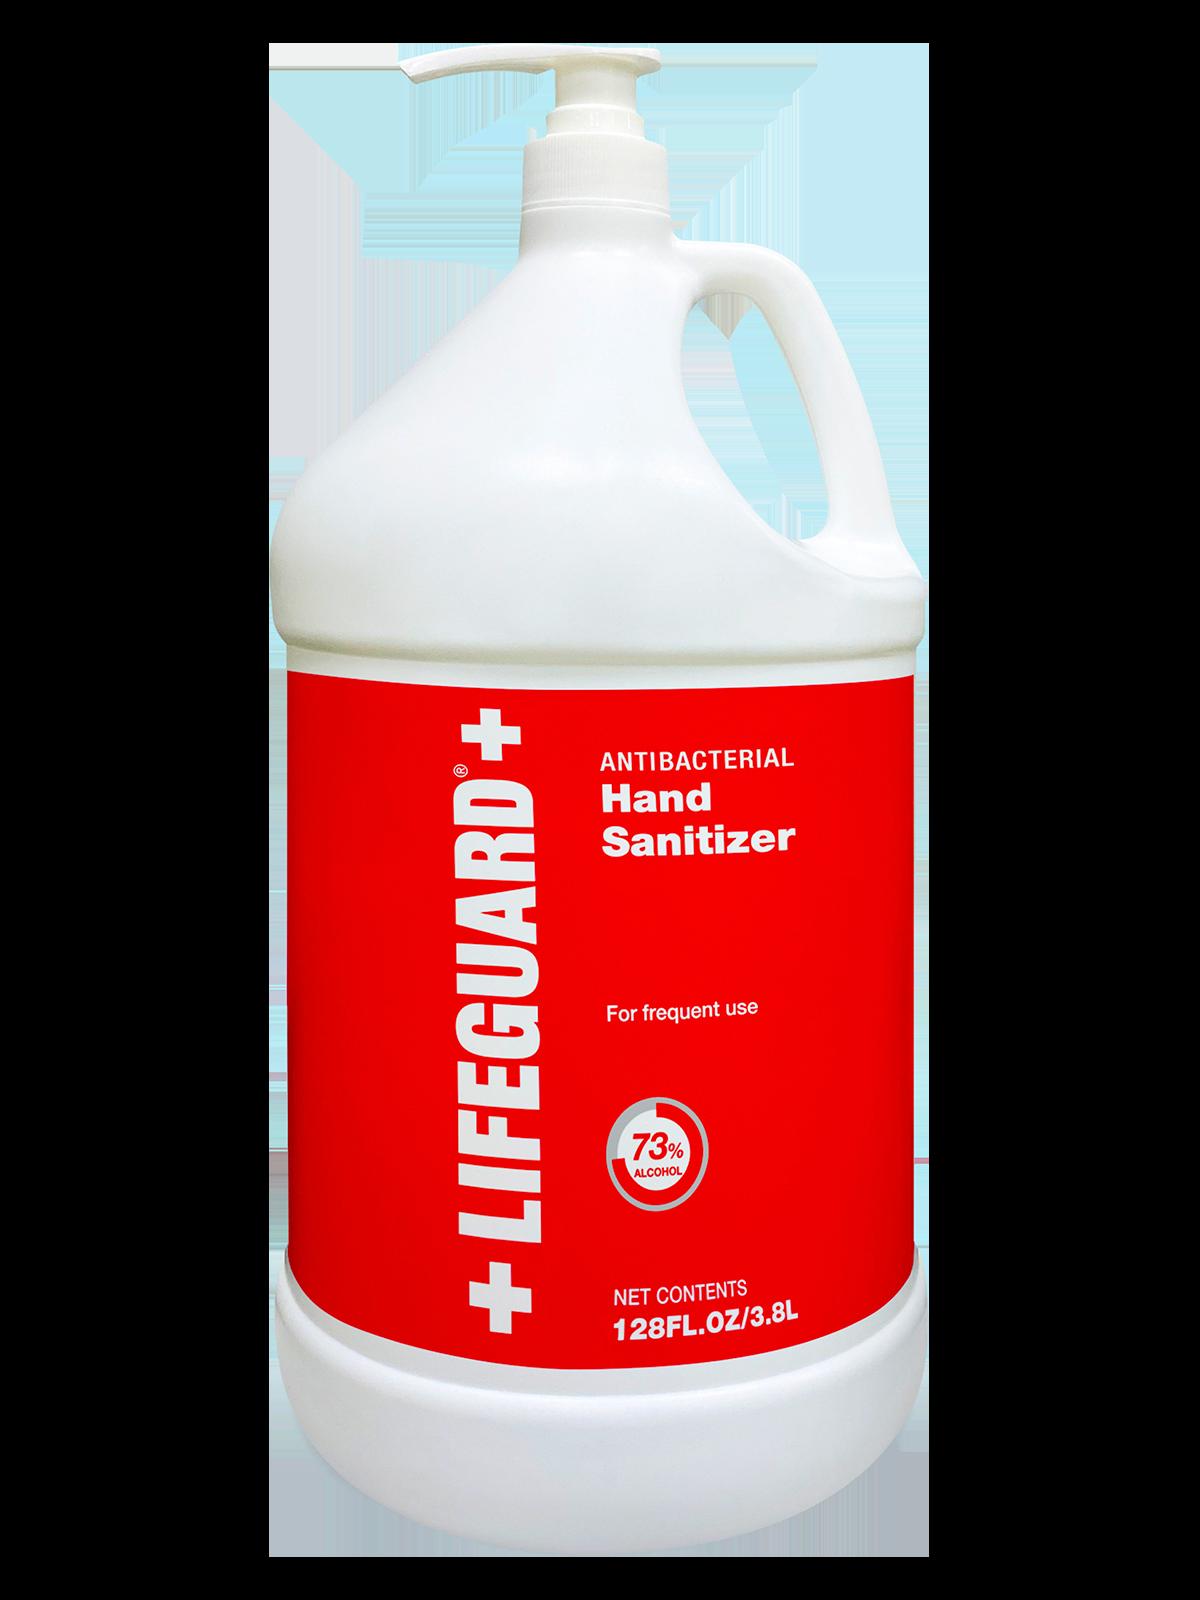 Hand Sanitizer 1 Gallon - 4 Gallons per case